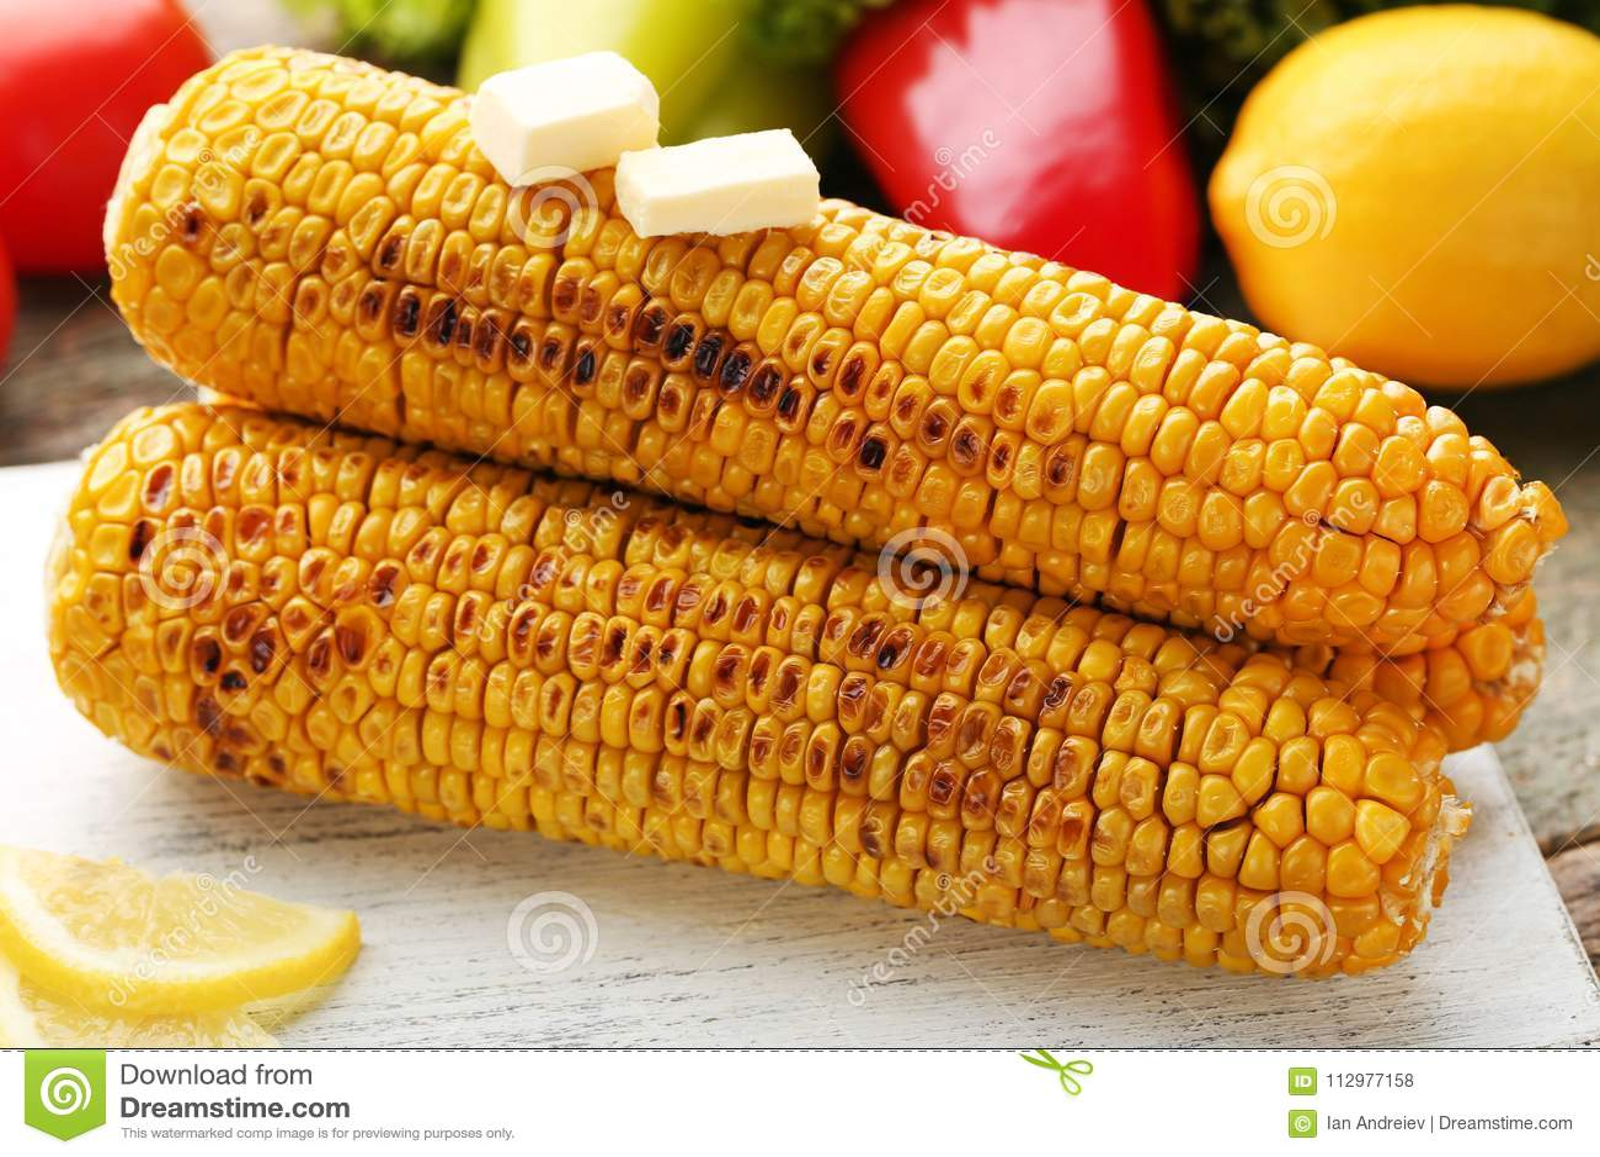 Tasty grilled corns